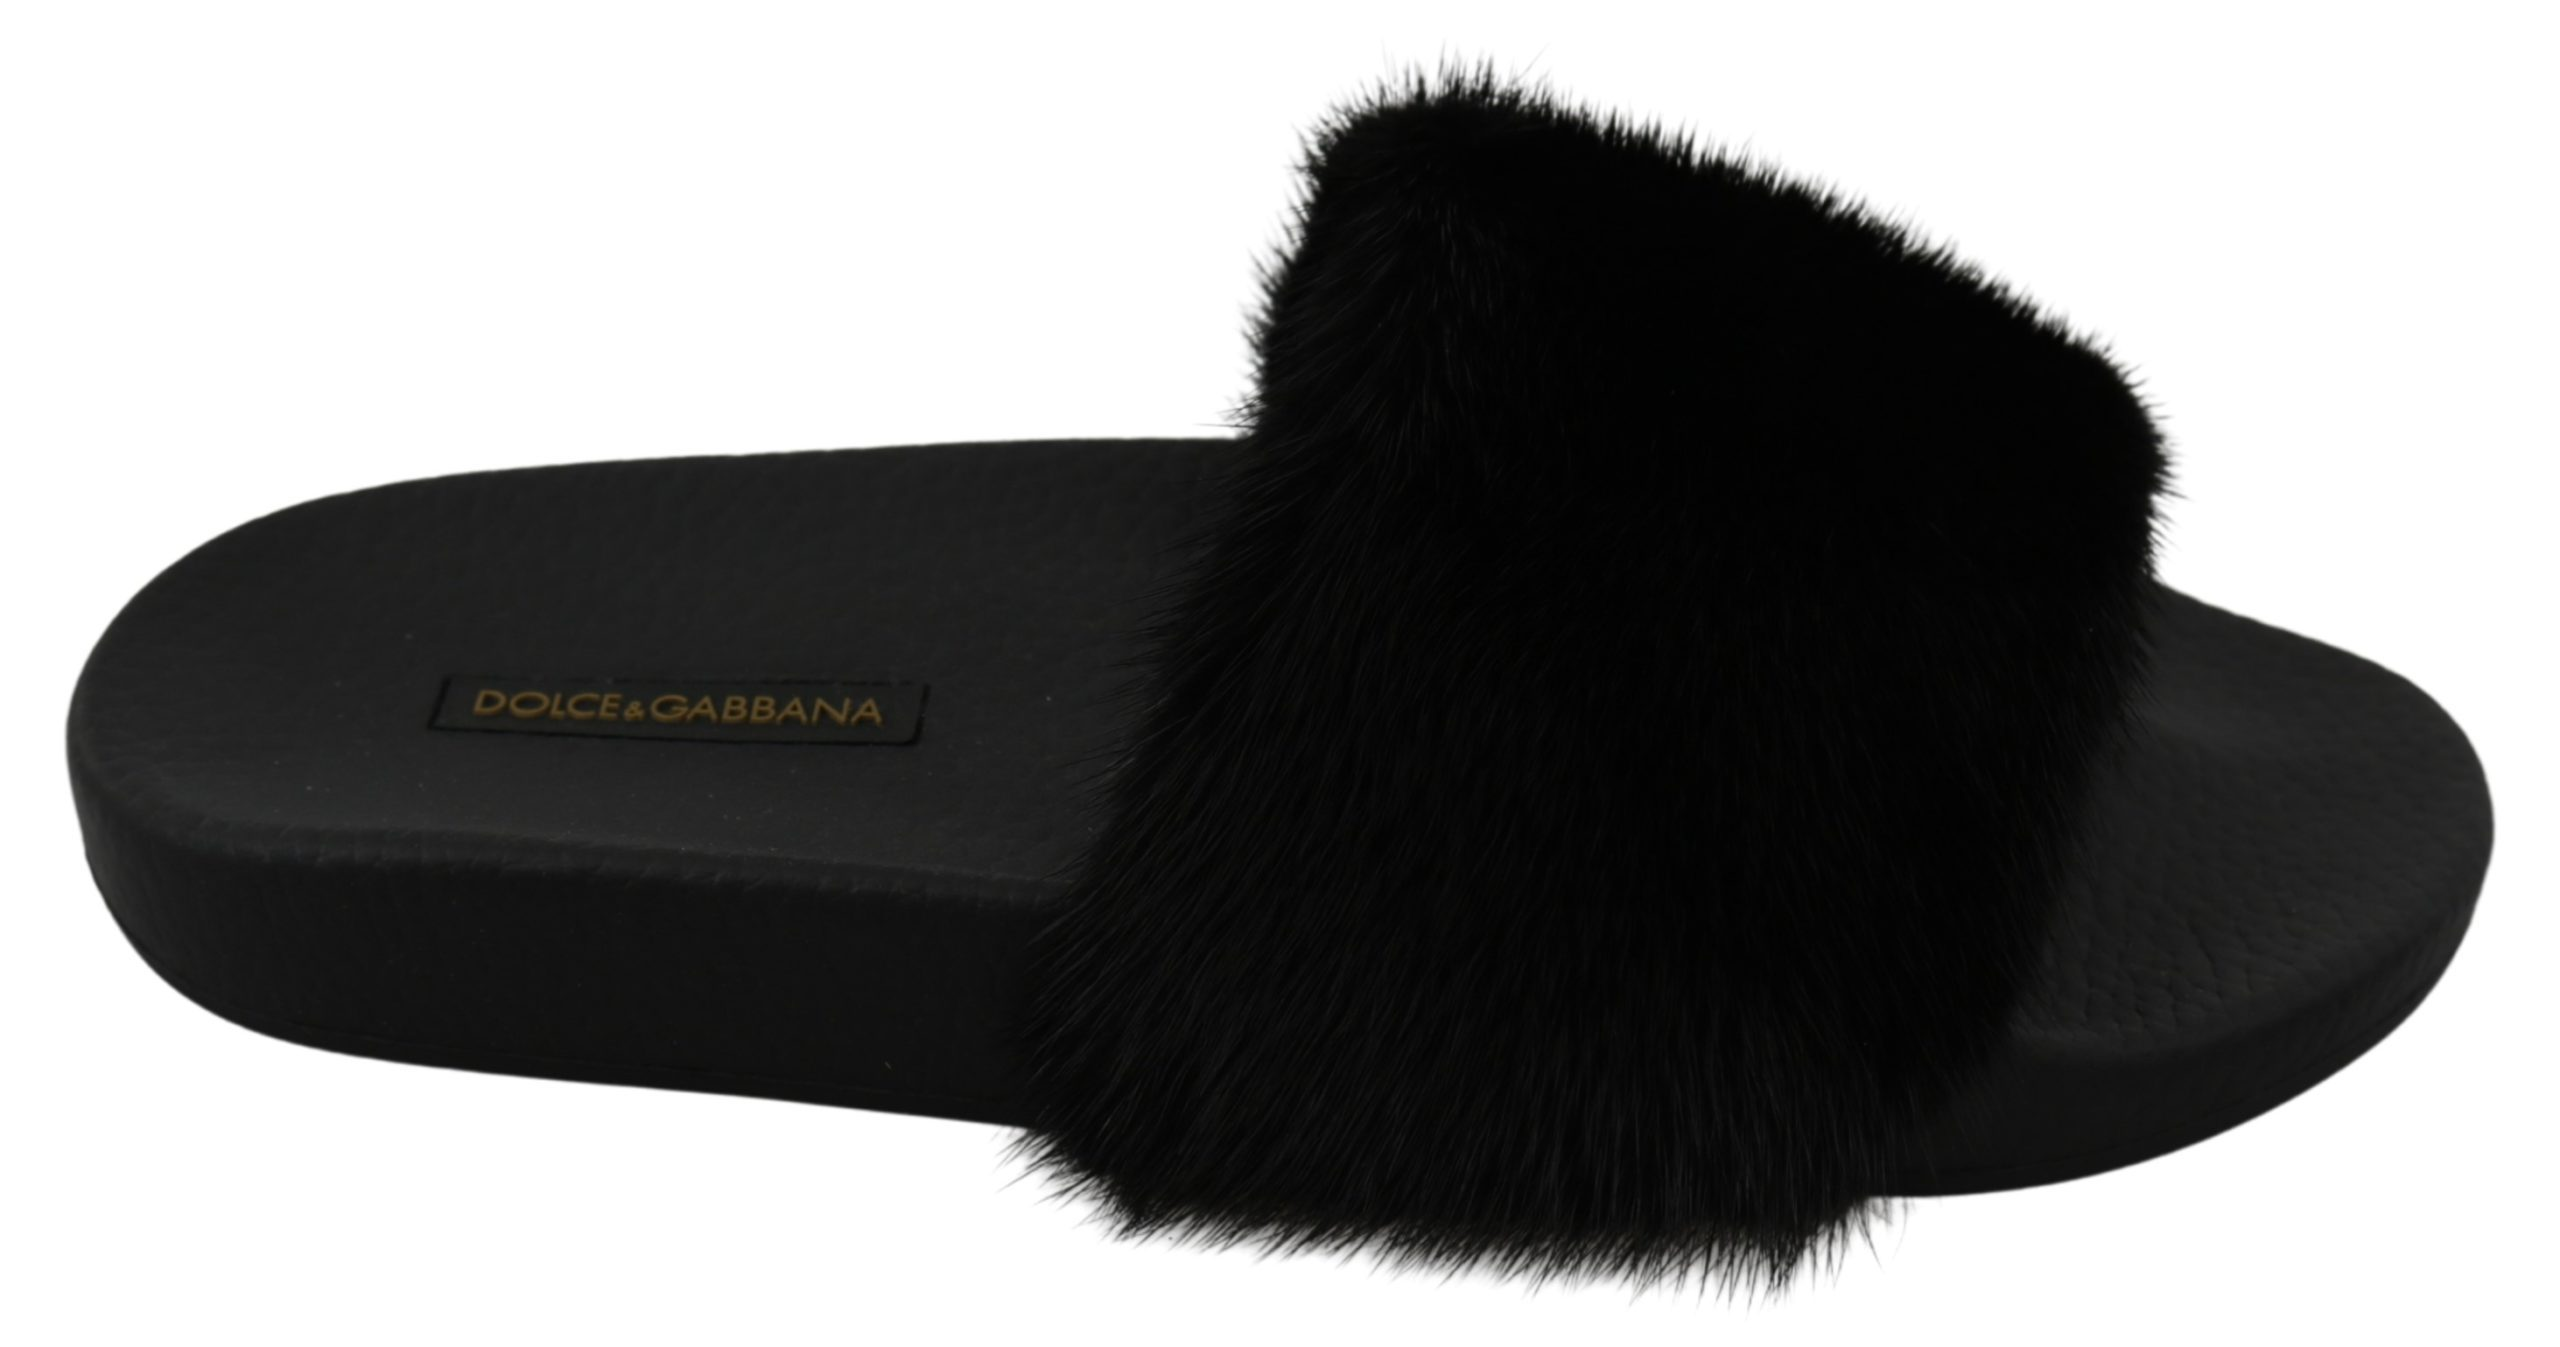 Dolce & Gabbana Women's Fur Slides Flats Black LA7299 - EU37/US6.5